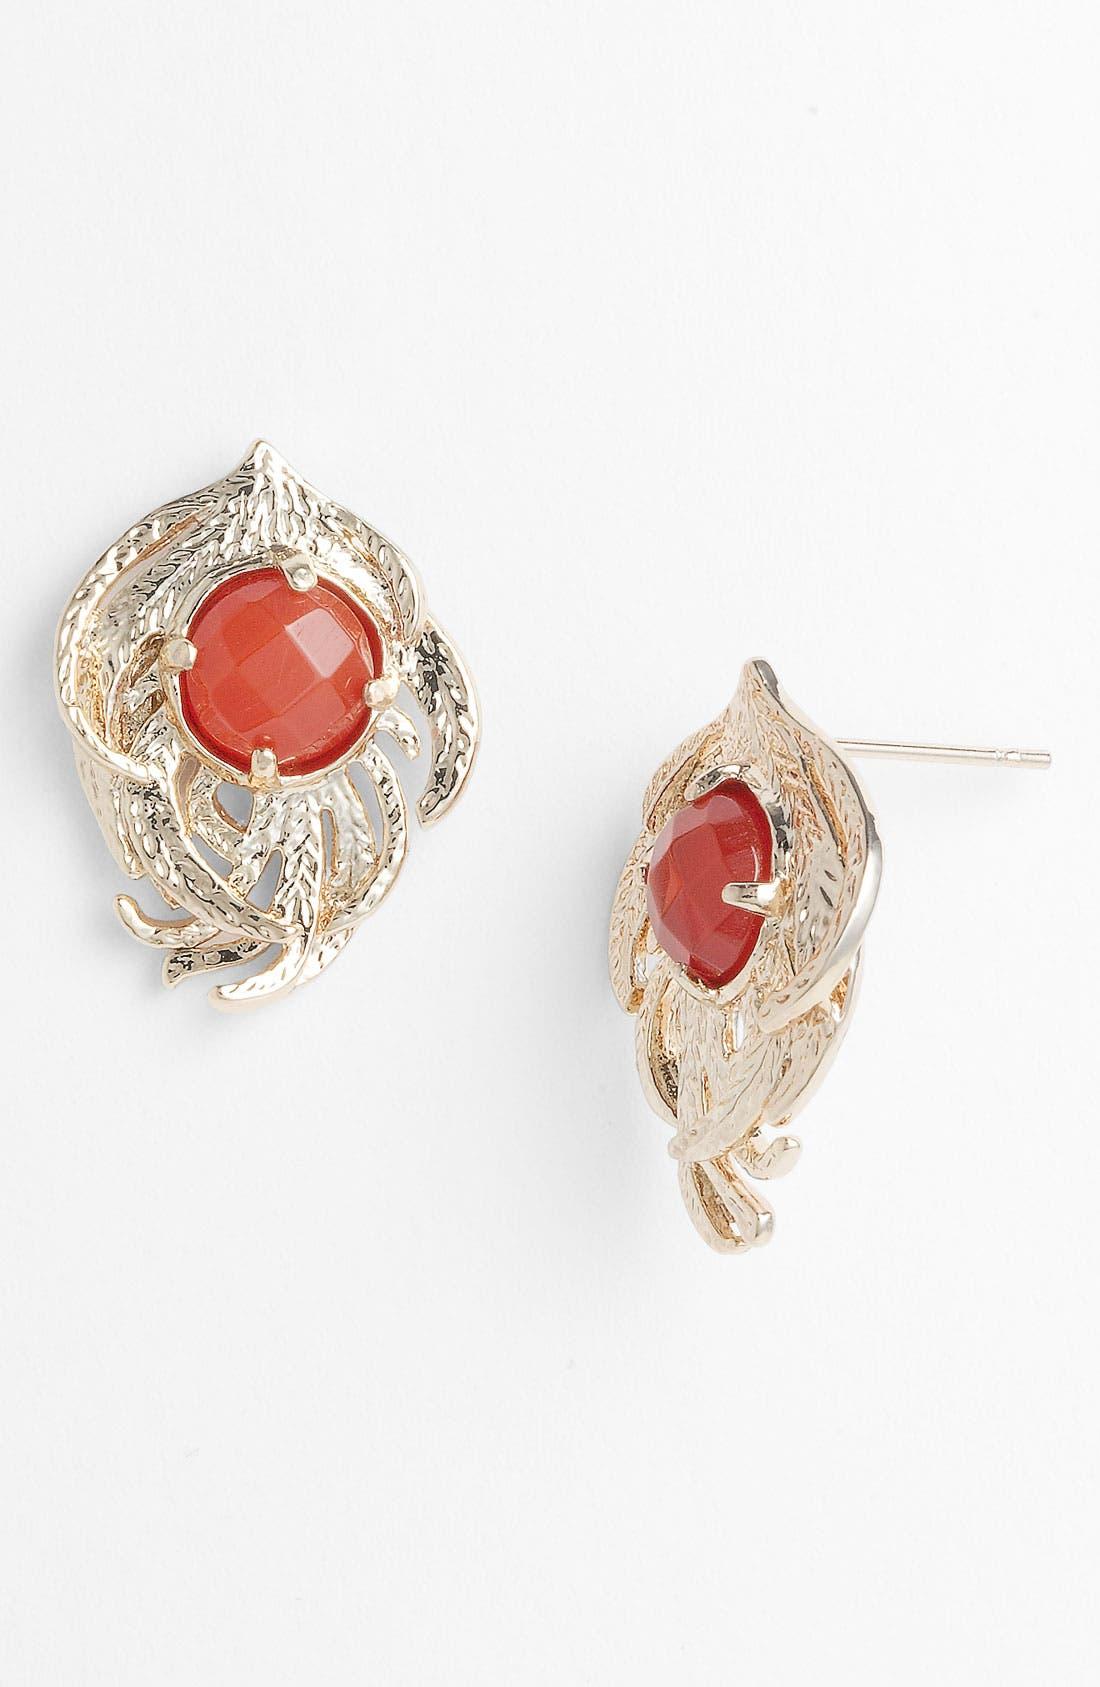 Main Image - Kendra Scott 'Hailey' Stud Earrings